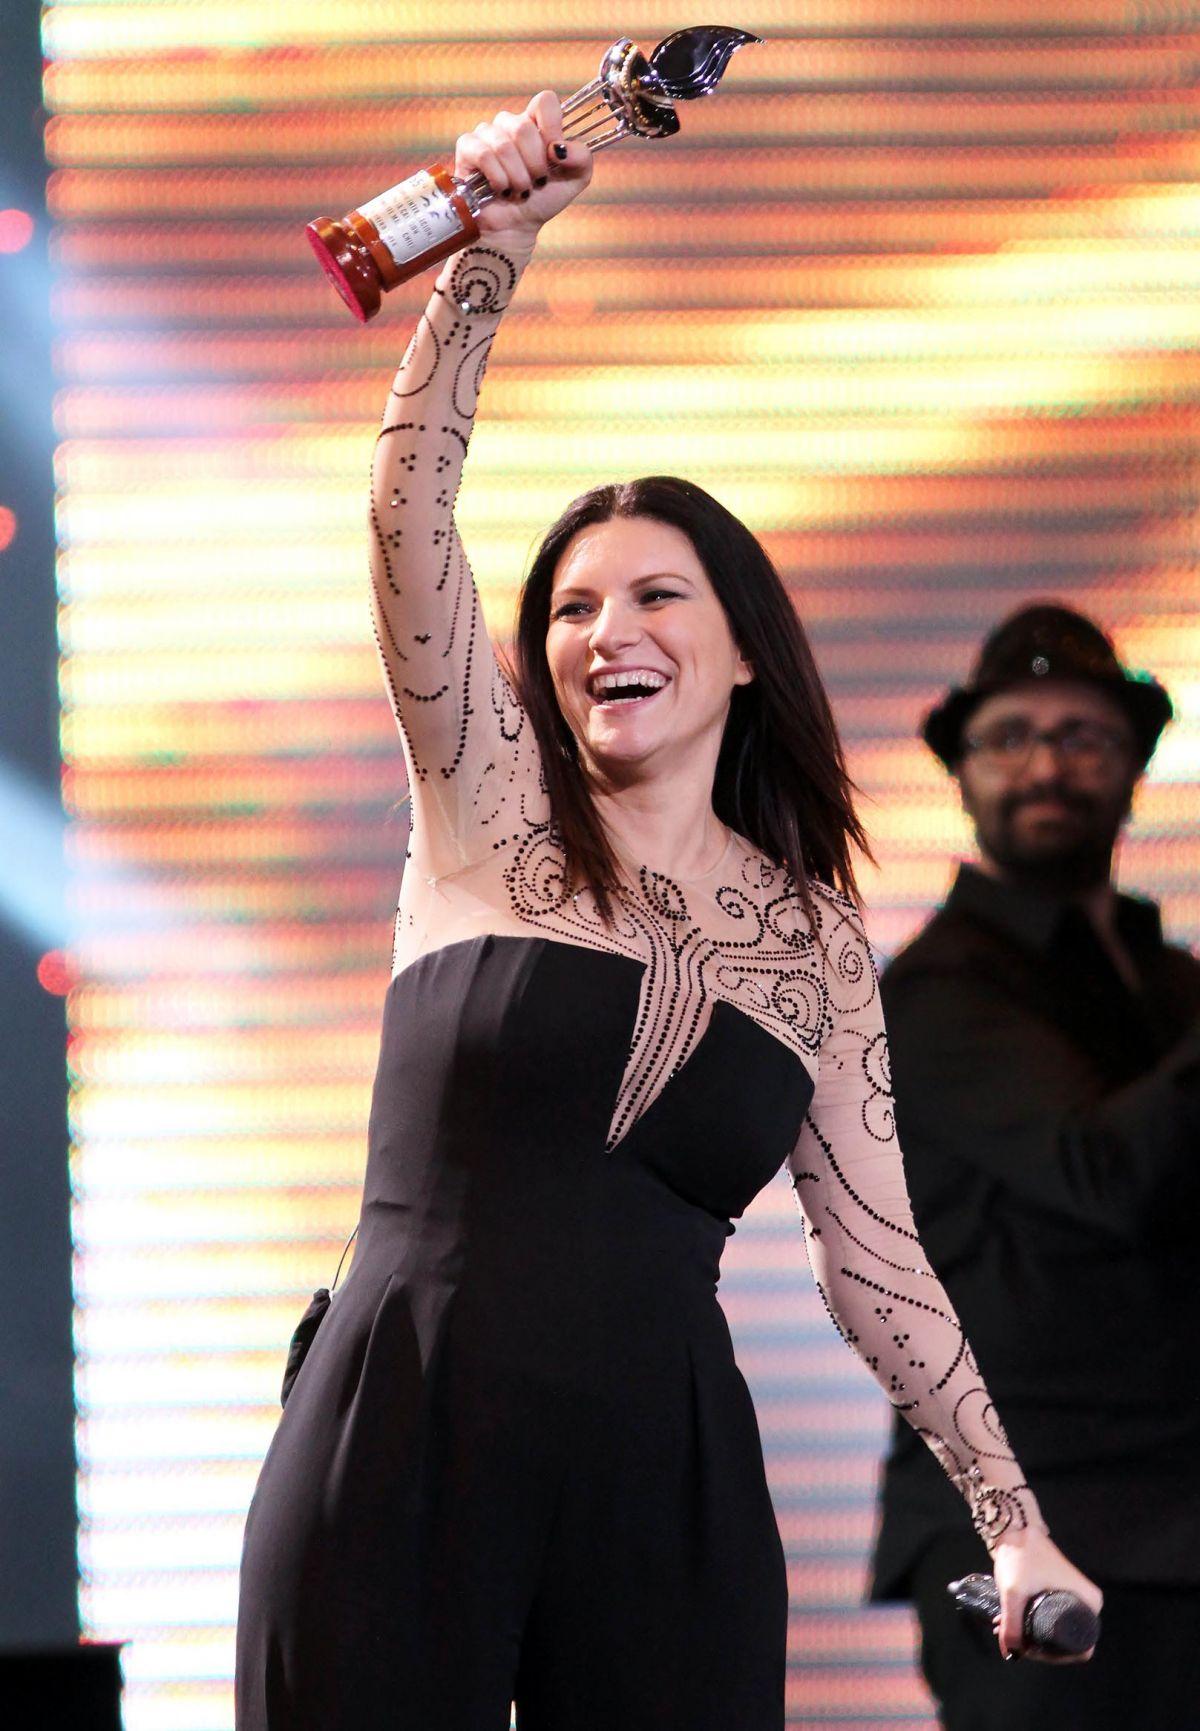 LAURA PAUSINI Performs at Vina Del Mar Festival in Chile